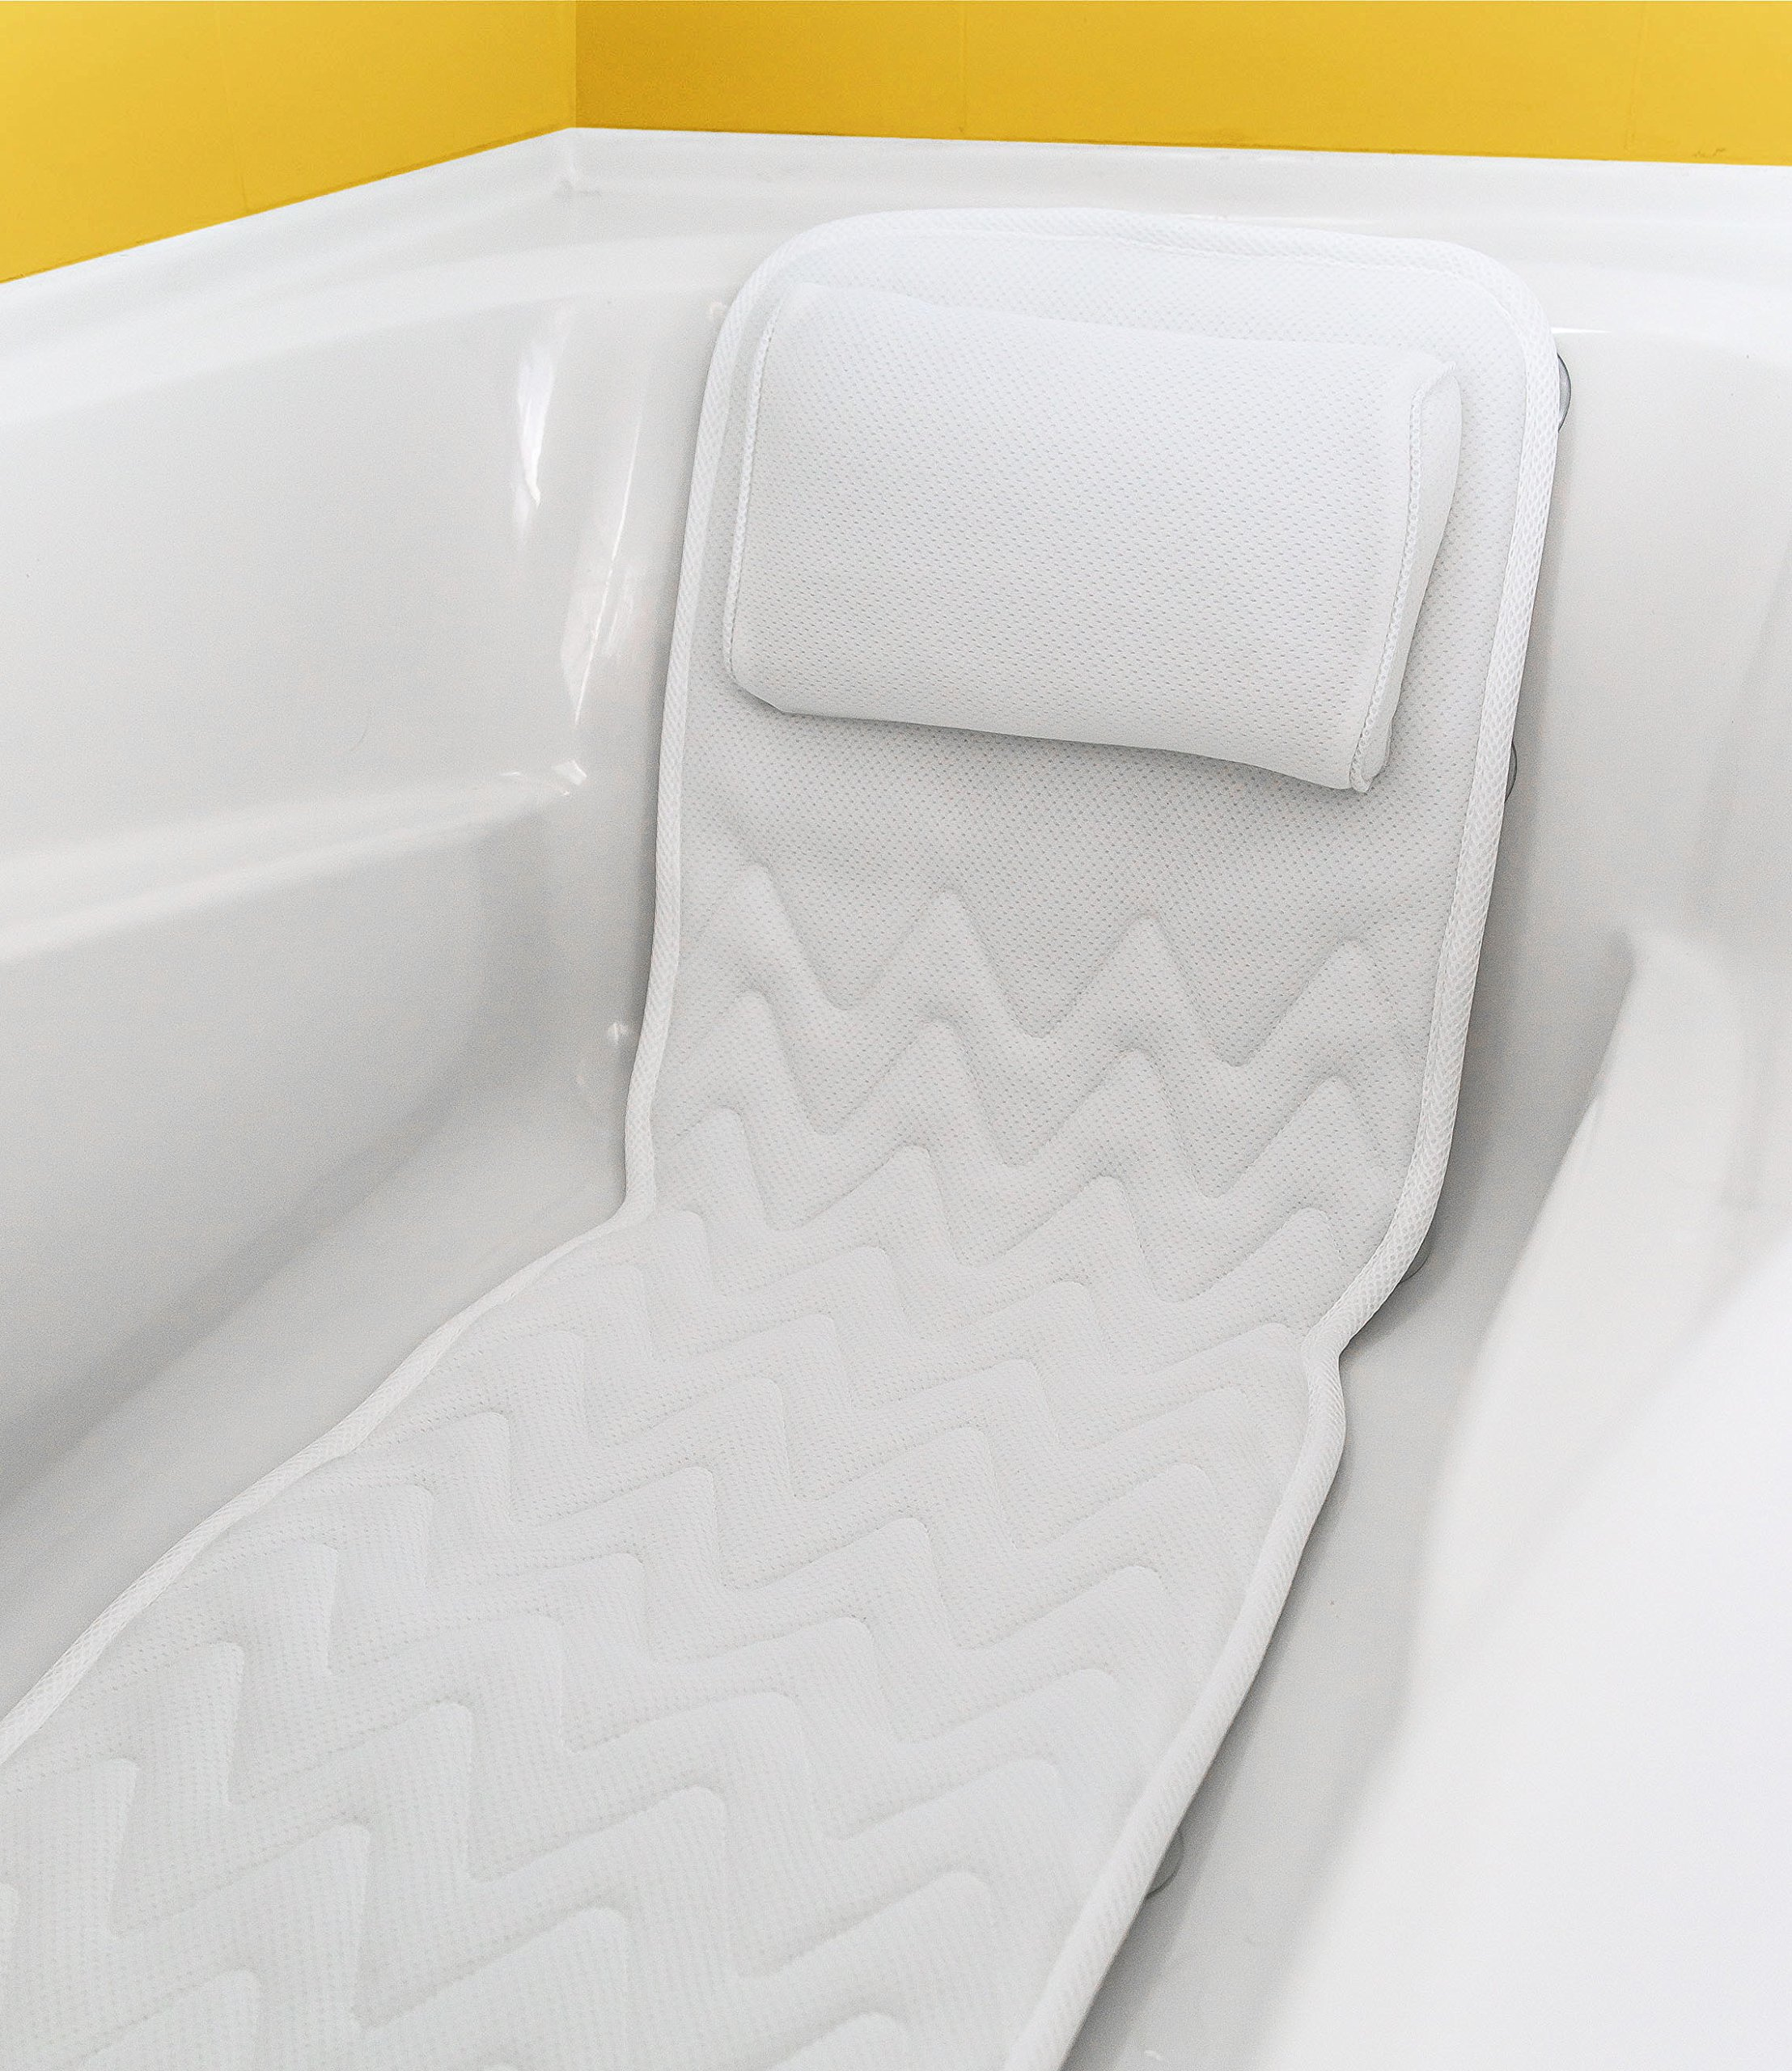 Full Body Bath Pillow & Mat – Non-Slip, Plus Konjac Bath Sponge, Luxury Cushion, Supports your head, Neck, Shoulder, Back and Tailbone, Anti-Bacterial